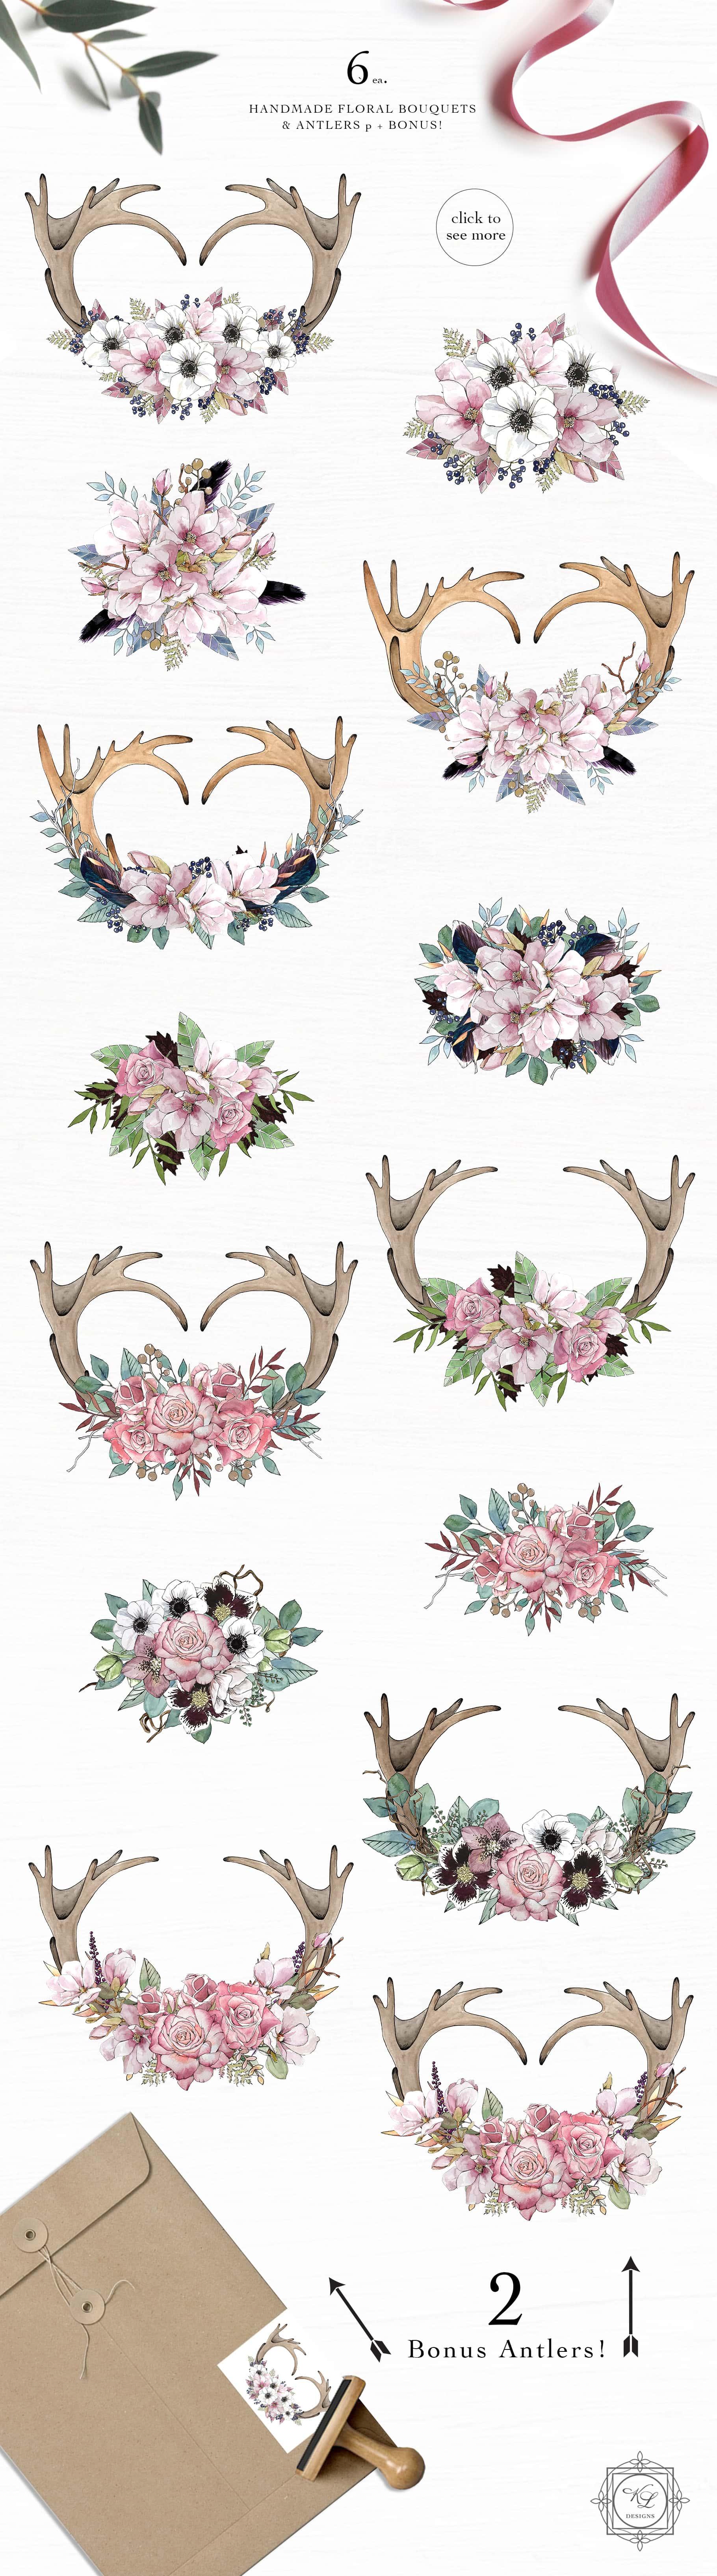 Watercolor & Illustrations Bundle 6